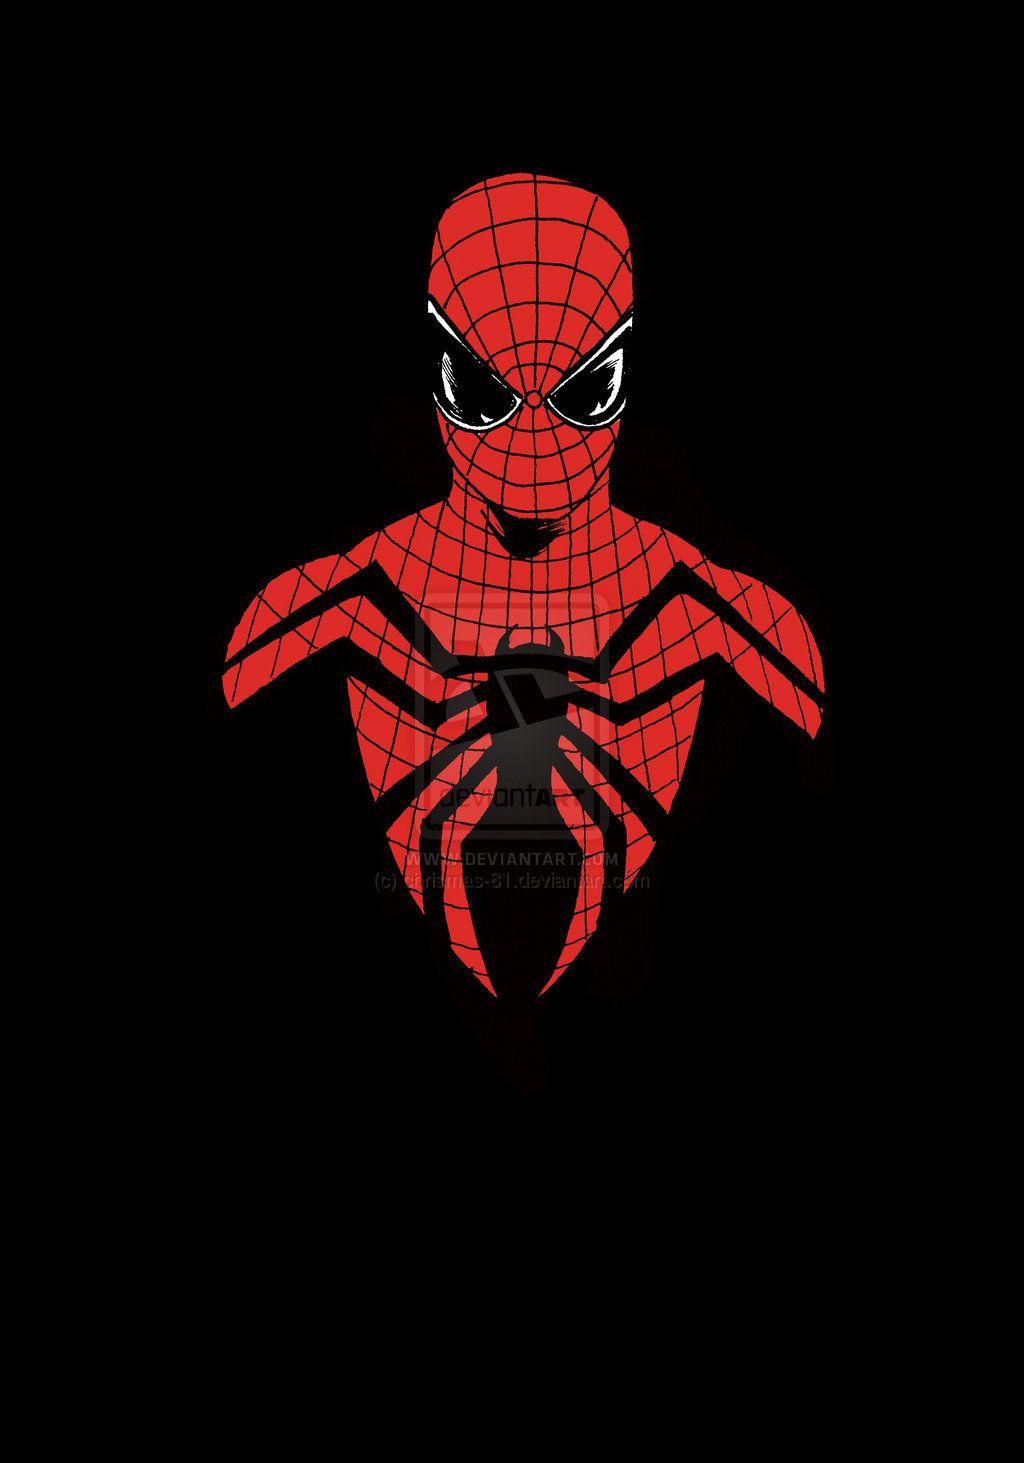 44 Wallpapers Iphone Spiderman 1929526 Hd Wallpaper